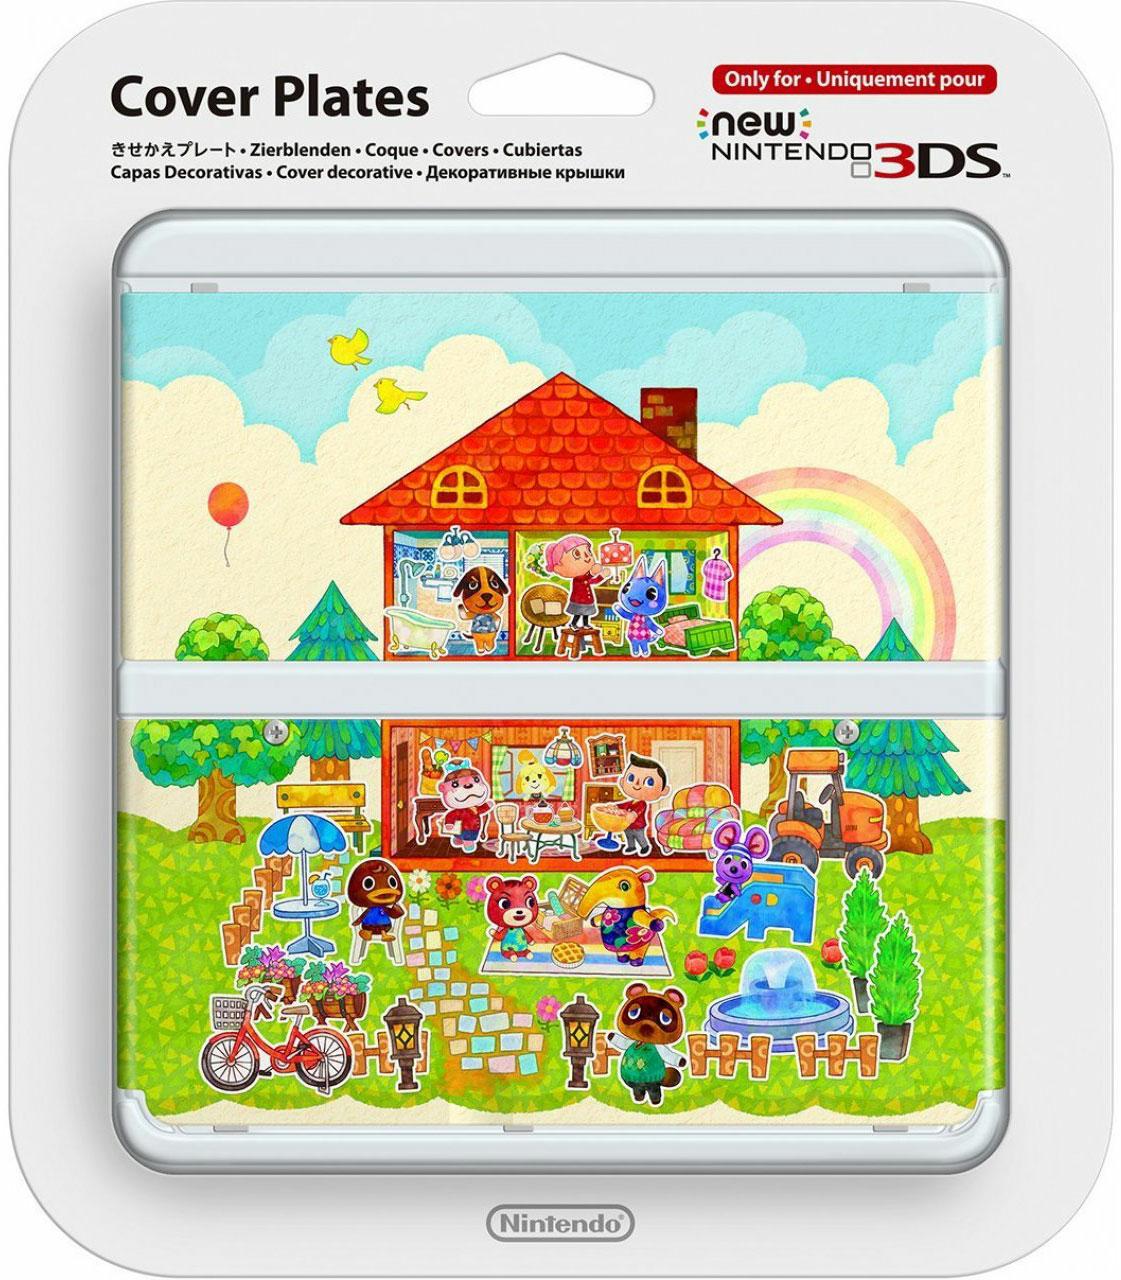 [VDS] Pleins de jeux 3DS, DS, GC, Wii U, goodies New-3ds-animal-crossing-happy-home-designer-edition-55d35af94f3be